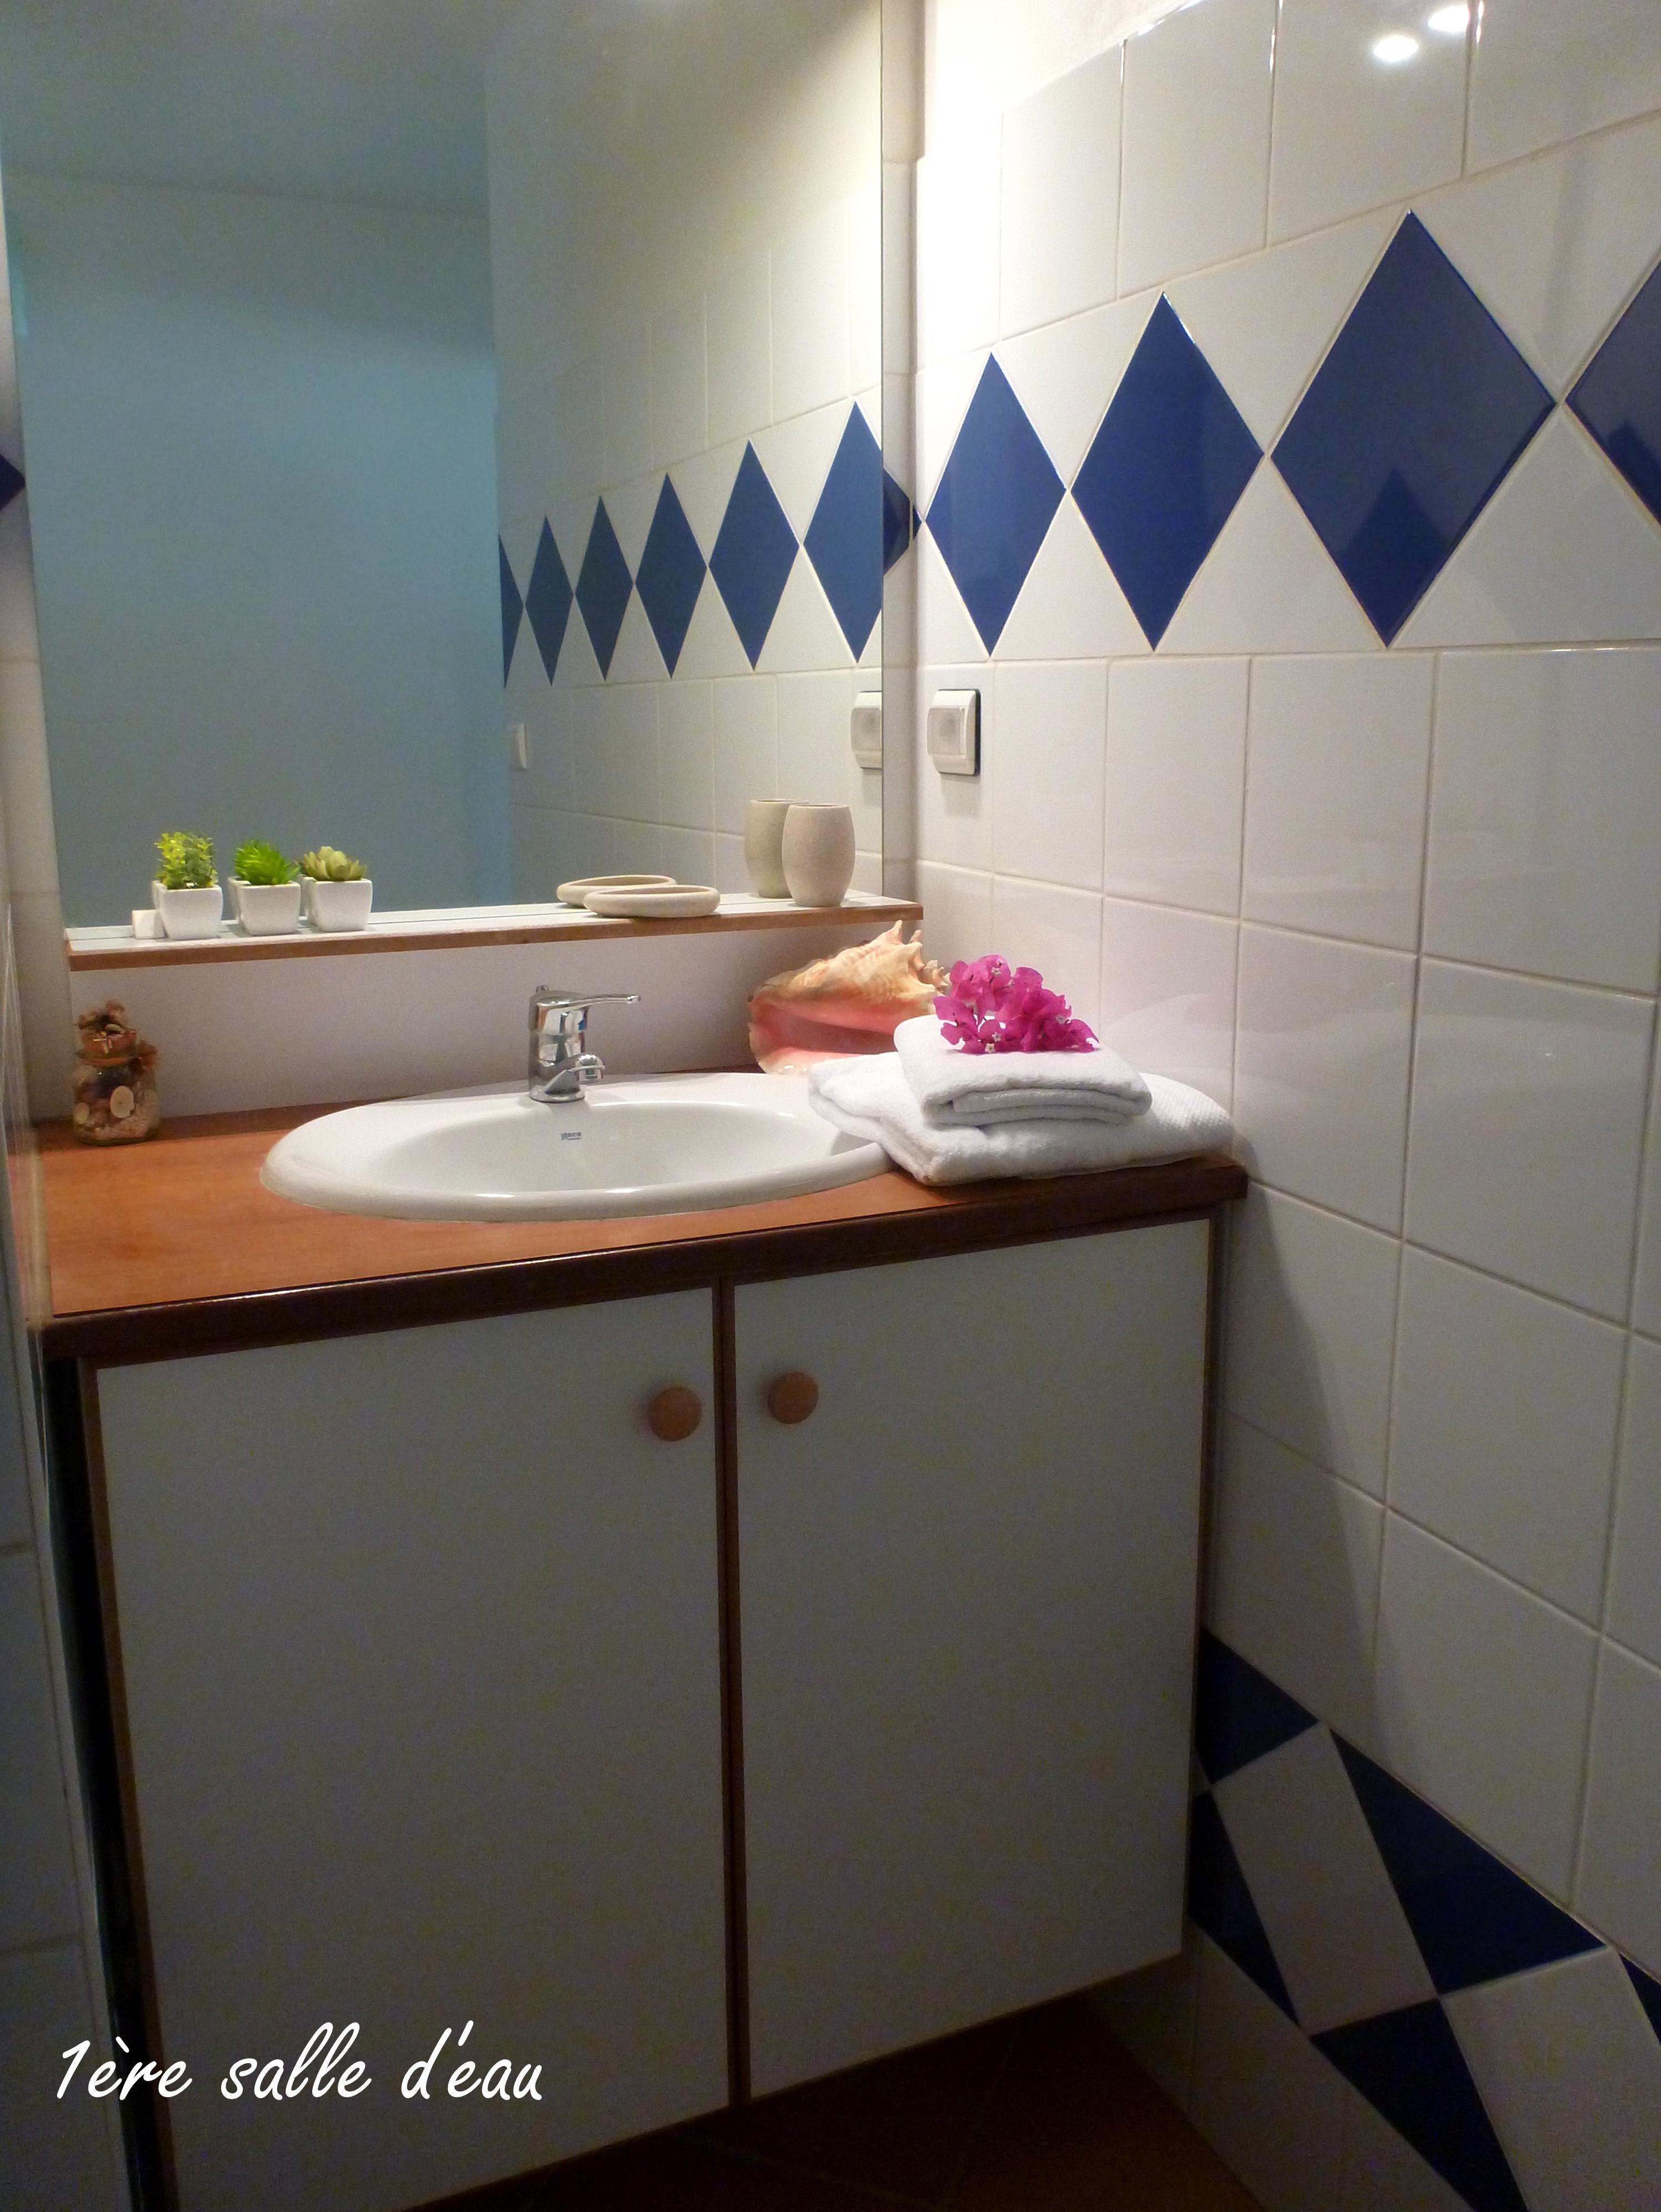 Anoli Location_Salle de bain Bleue